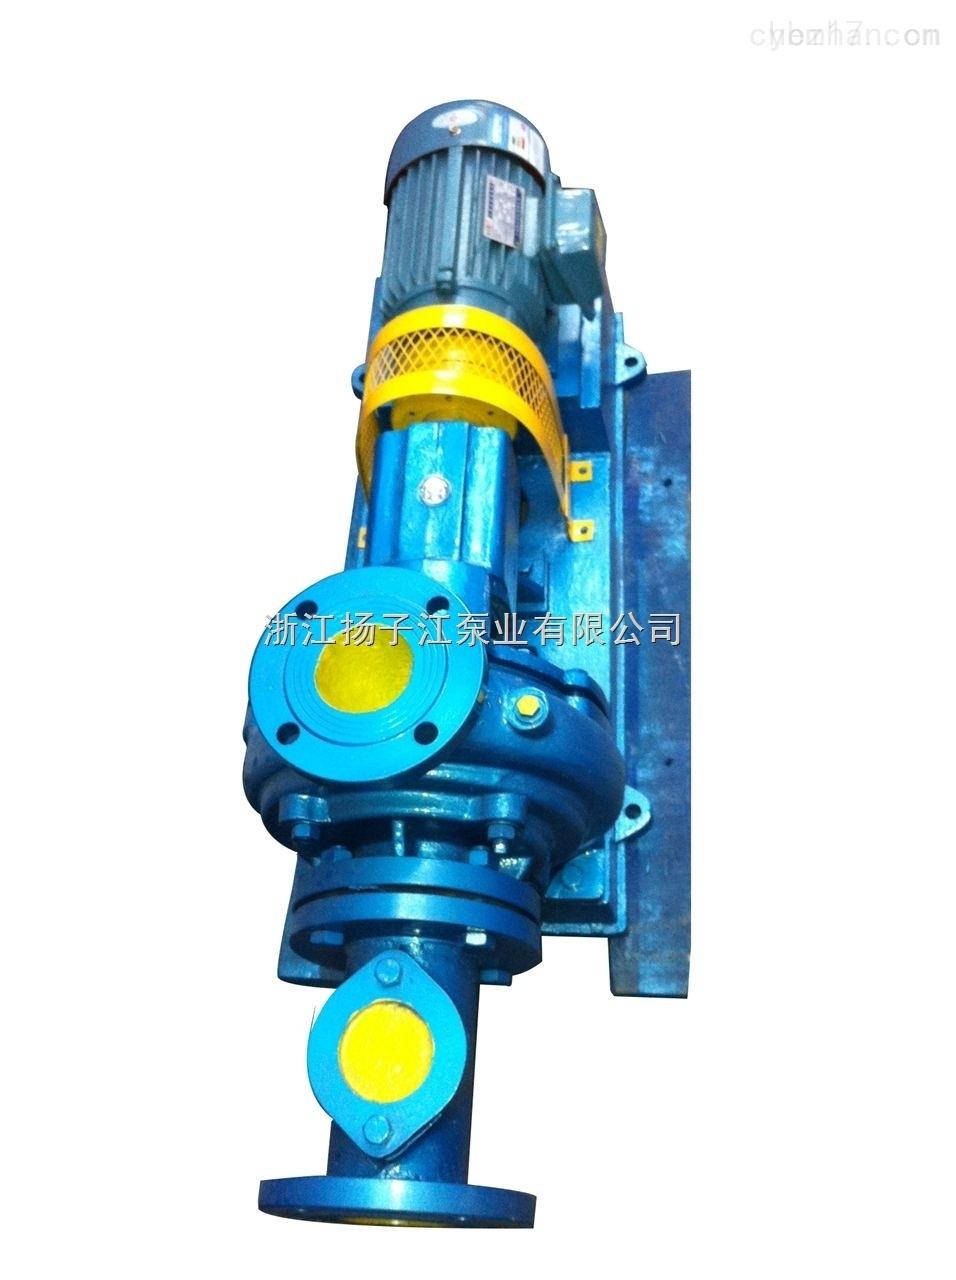 XWJ型纸浆泵 新型无堵塞纸浆泵 100XWJ50-20